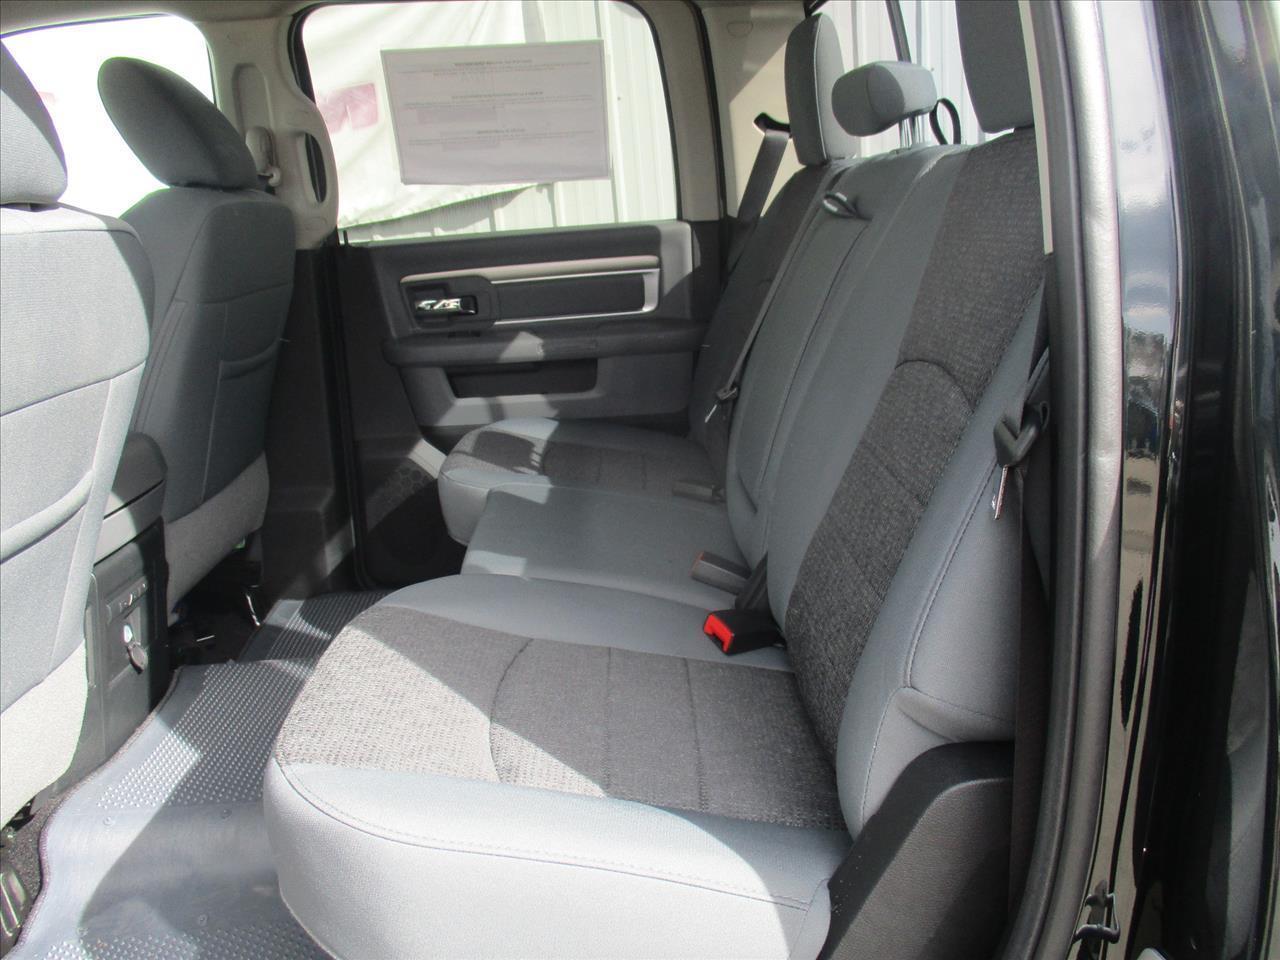 2017 RAM Ram Pickup 3500 4x4 SLT 4dr Crew Cab 8 ft. LB Pickup - Butte MT